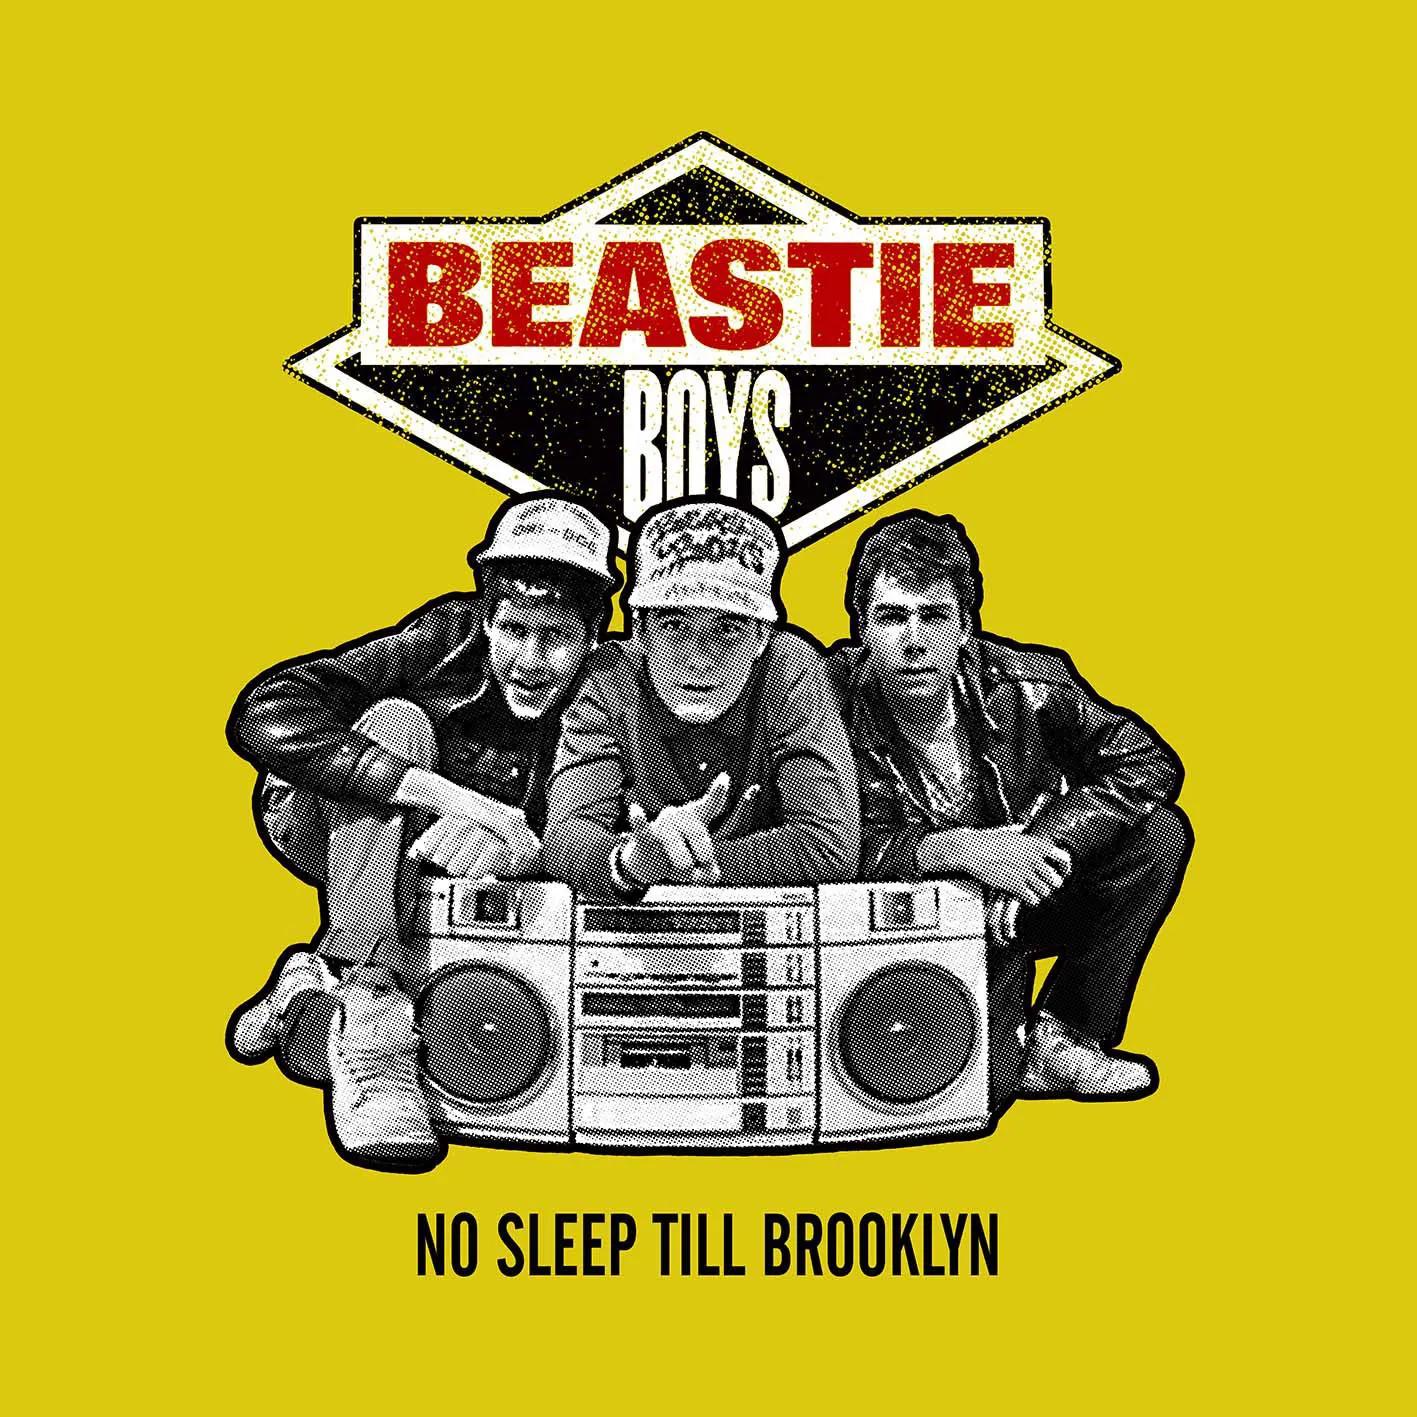 Quadro A4 - Beastie Boys